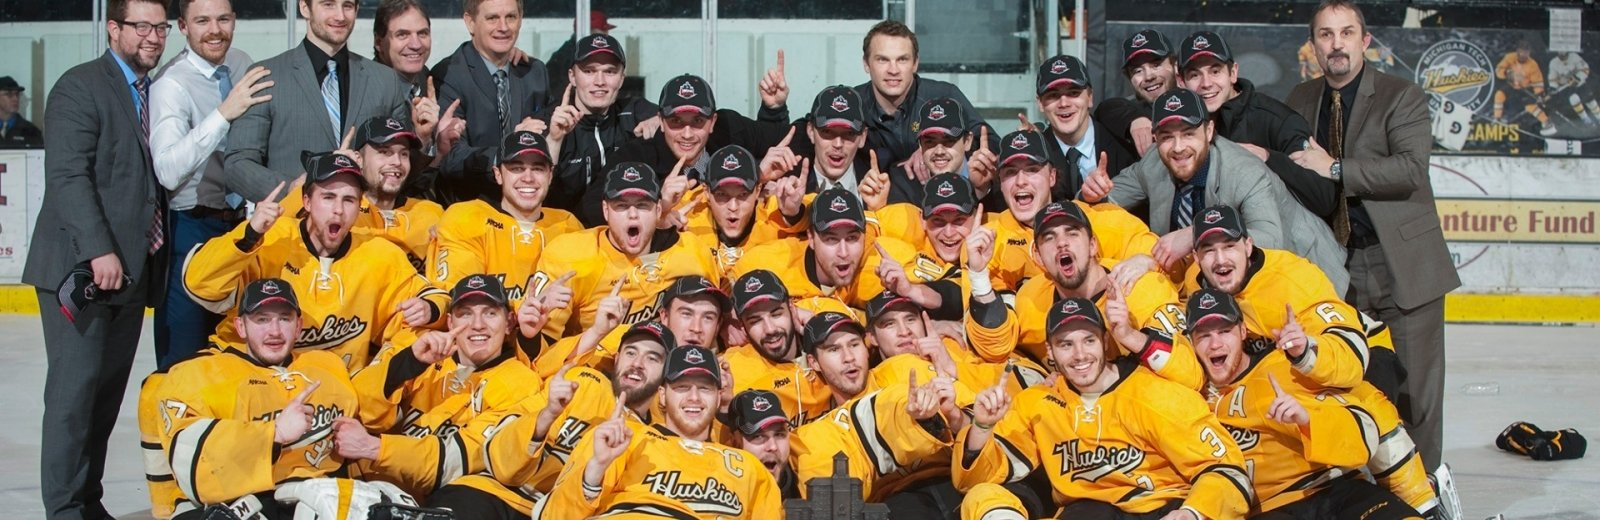 Michigan Tech hockey team.